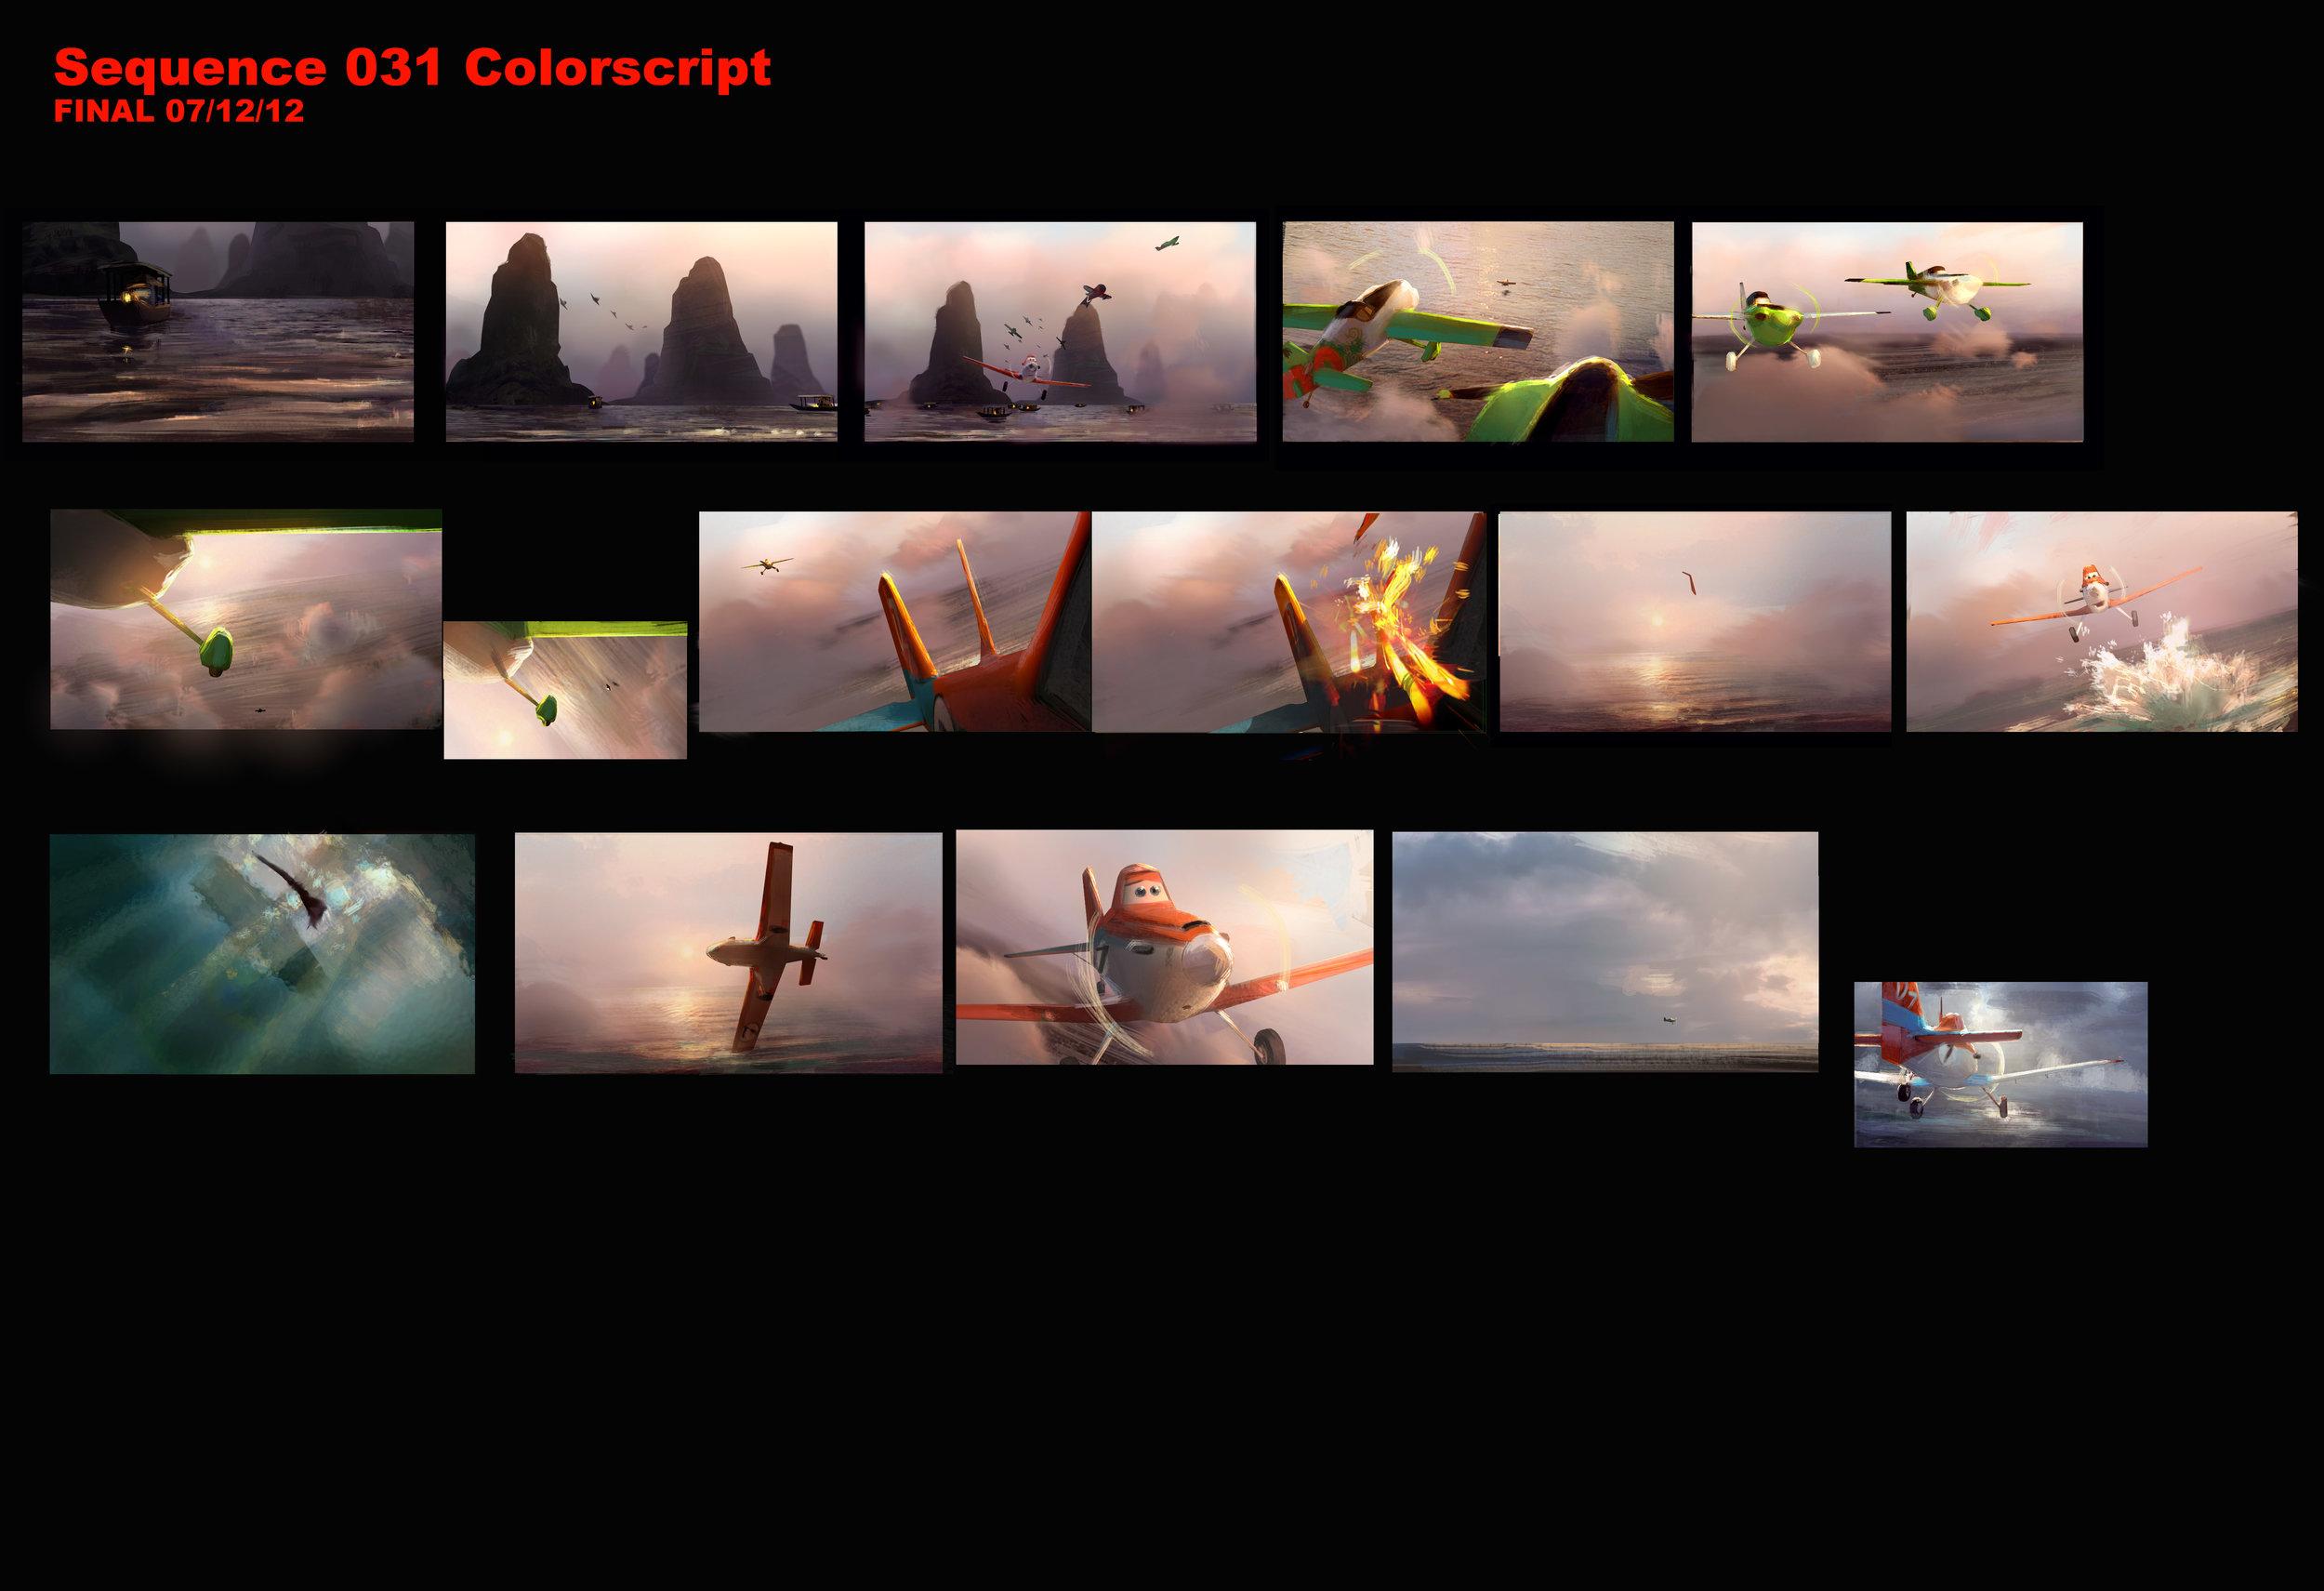 031_Colorscript_v005.jpg